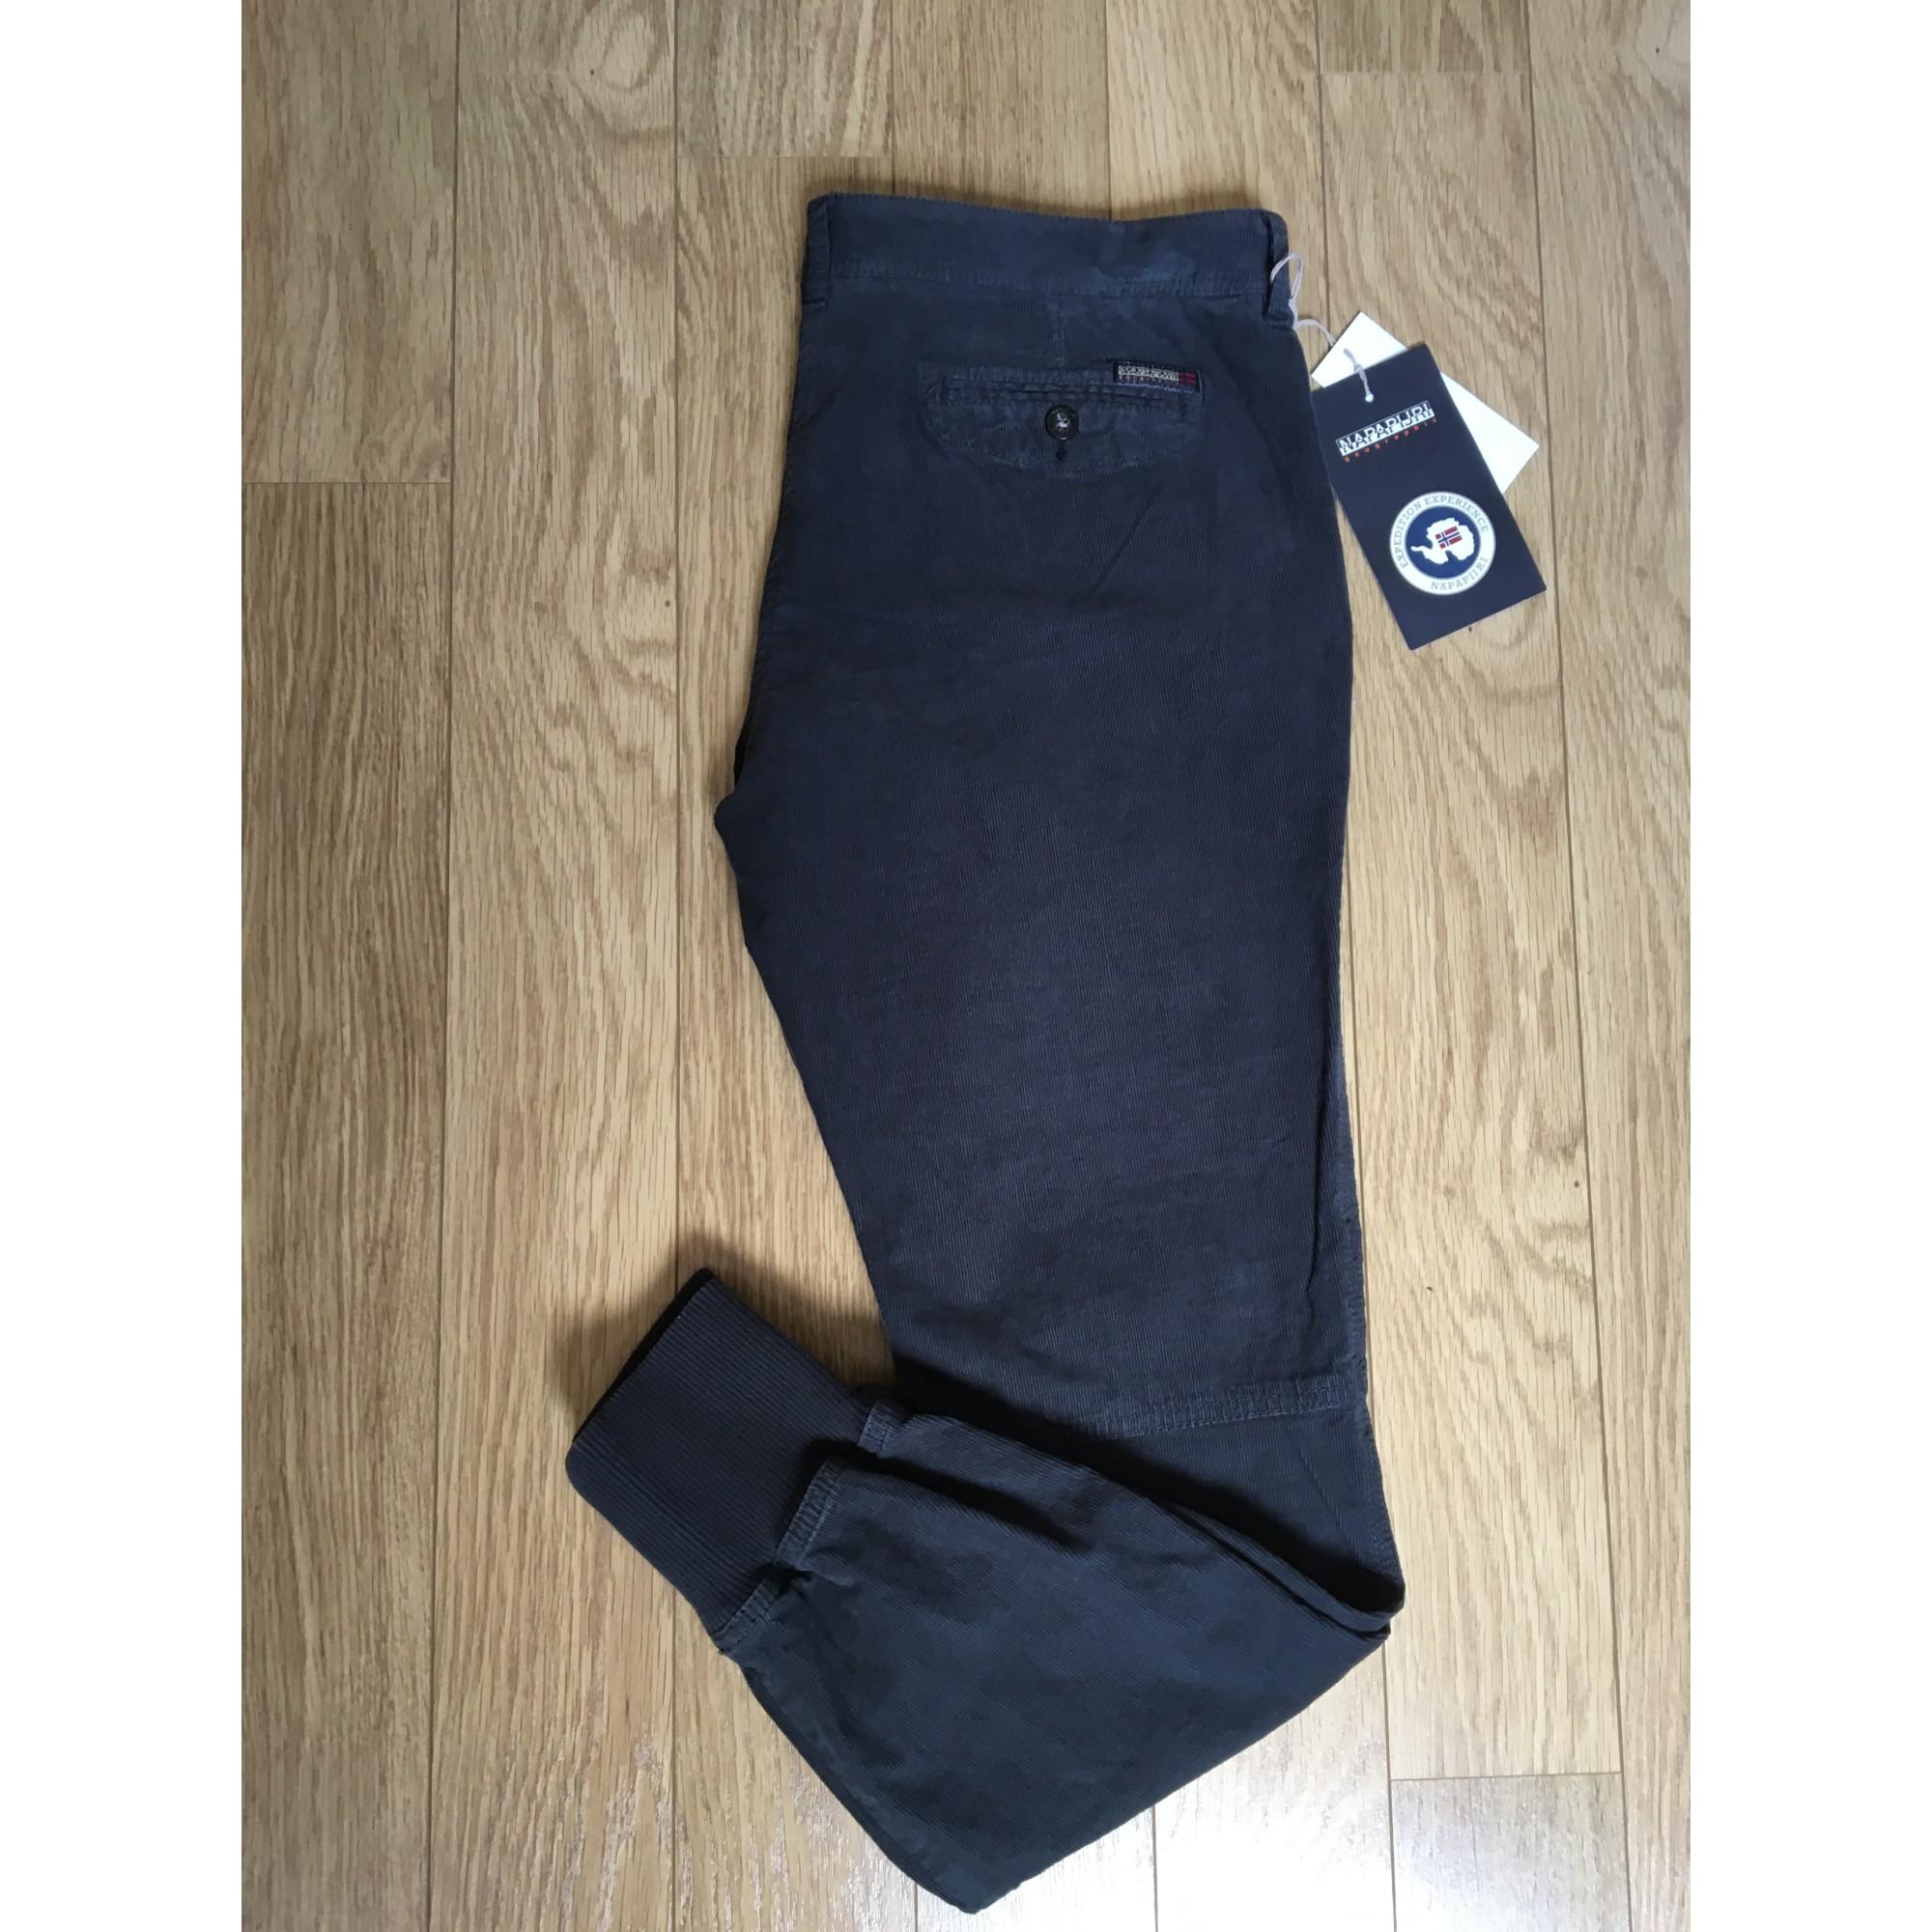 l Pantalon Napapijri Slim T3 40 Gris Cigarette 4682132 rw1wqIZ